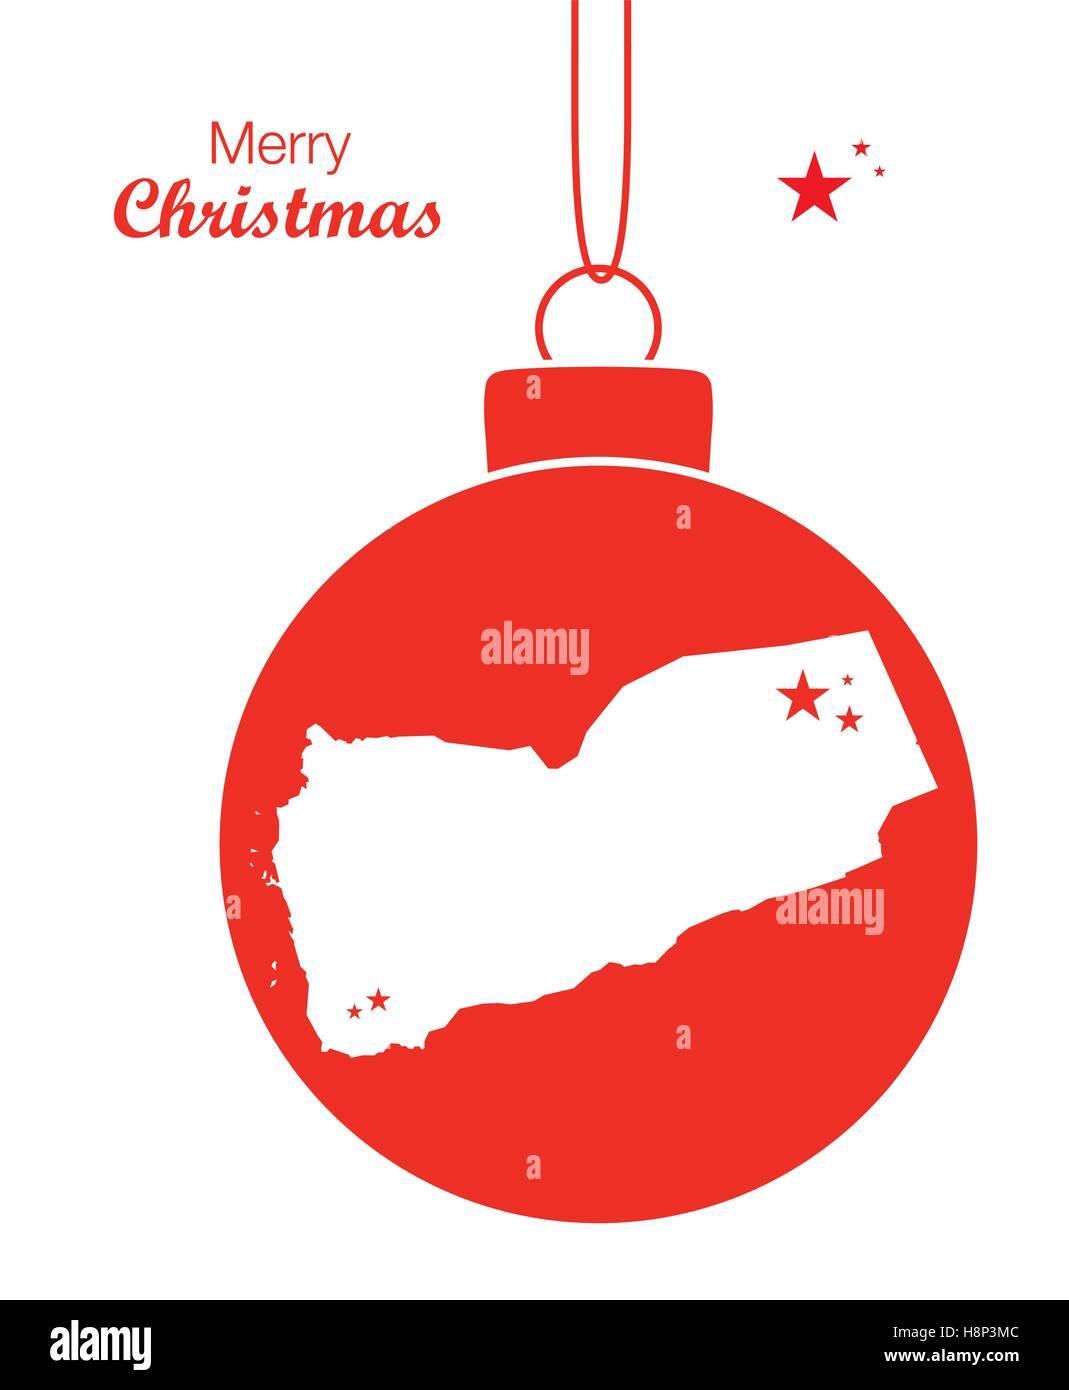 Merry Christmas illustration theme with map of Yemen - Stock Image